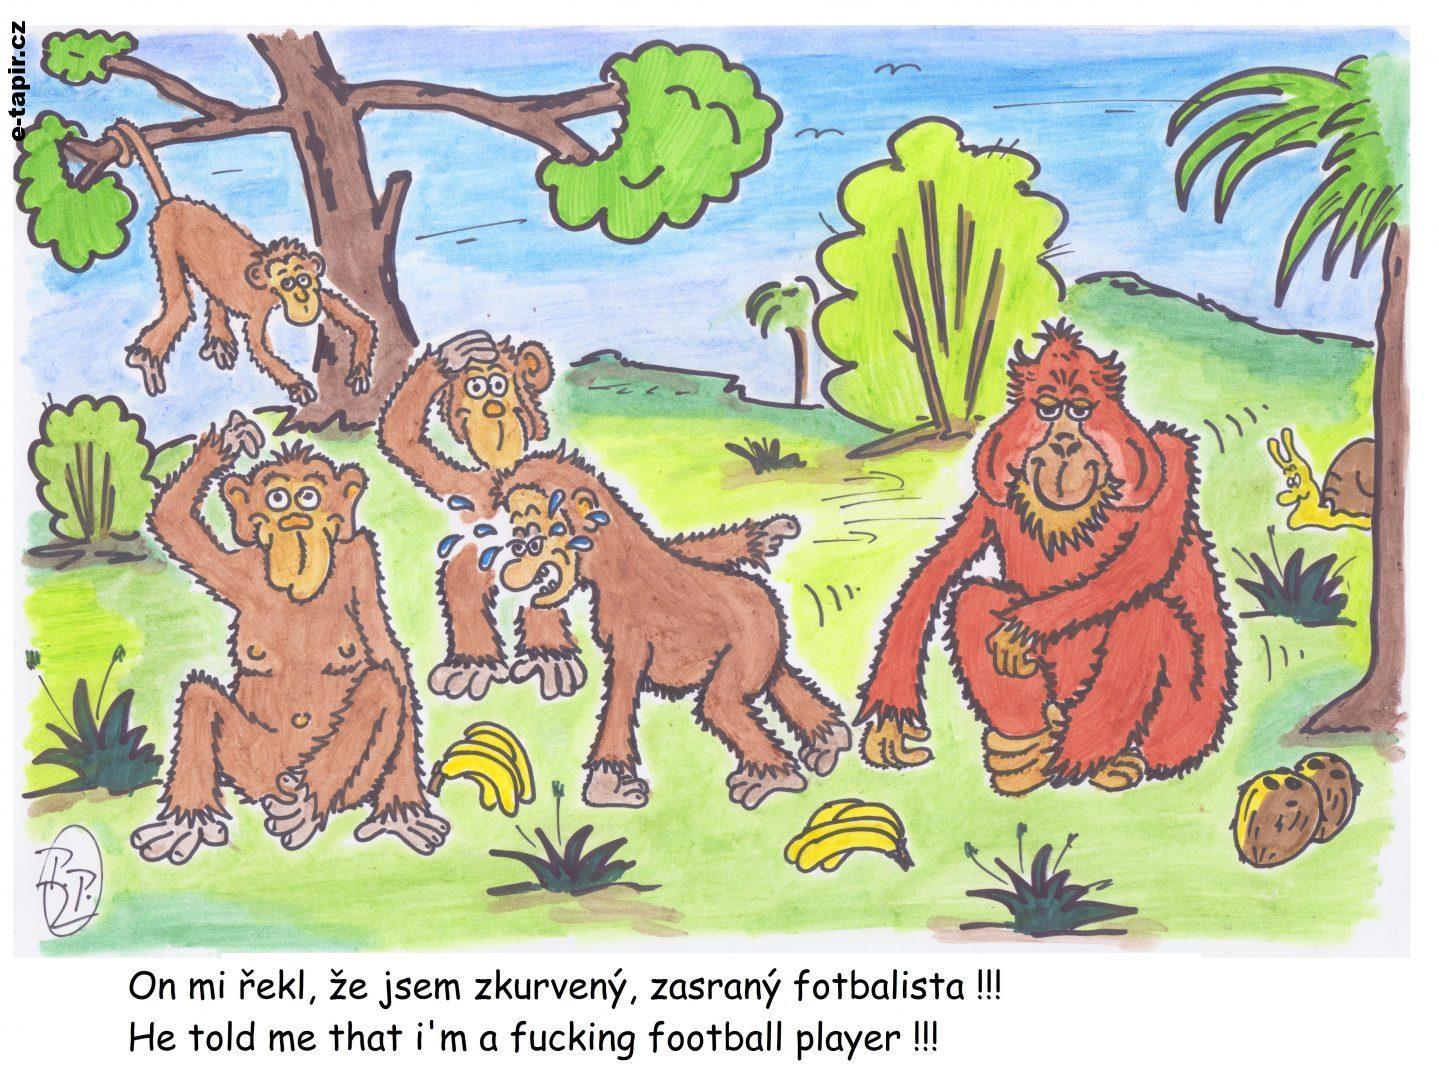 298 - Opičky-3ed4664a